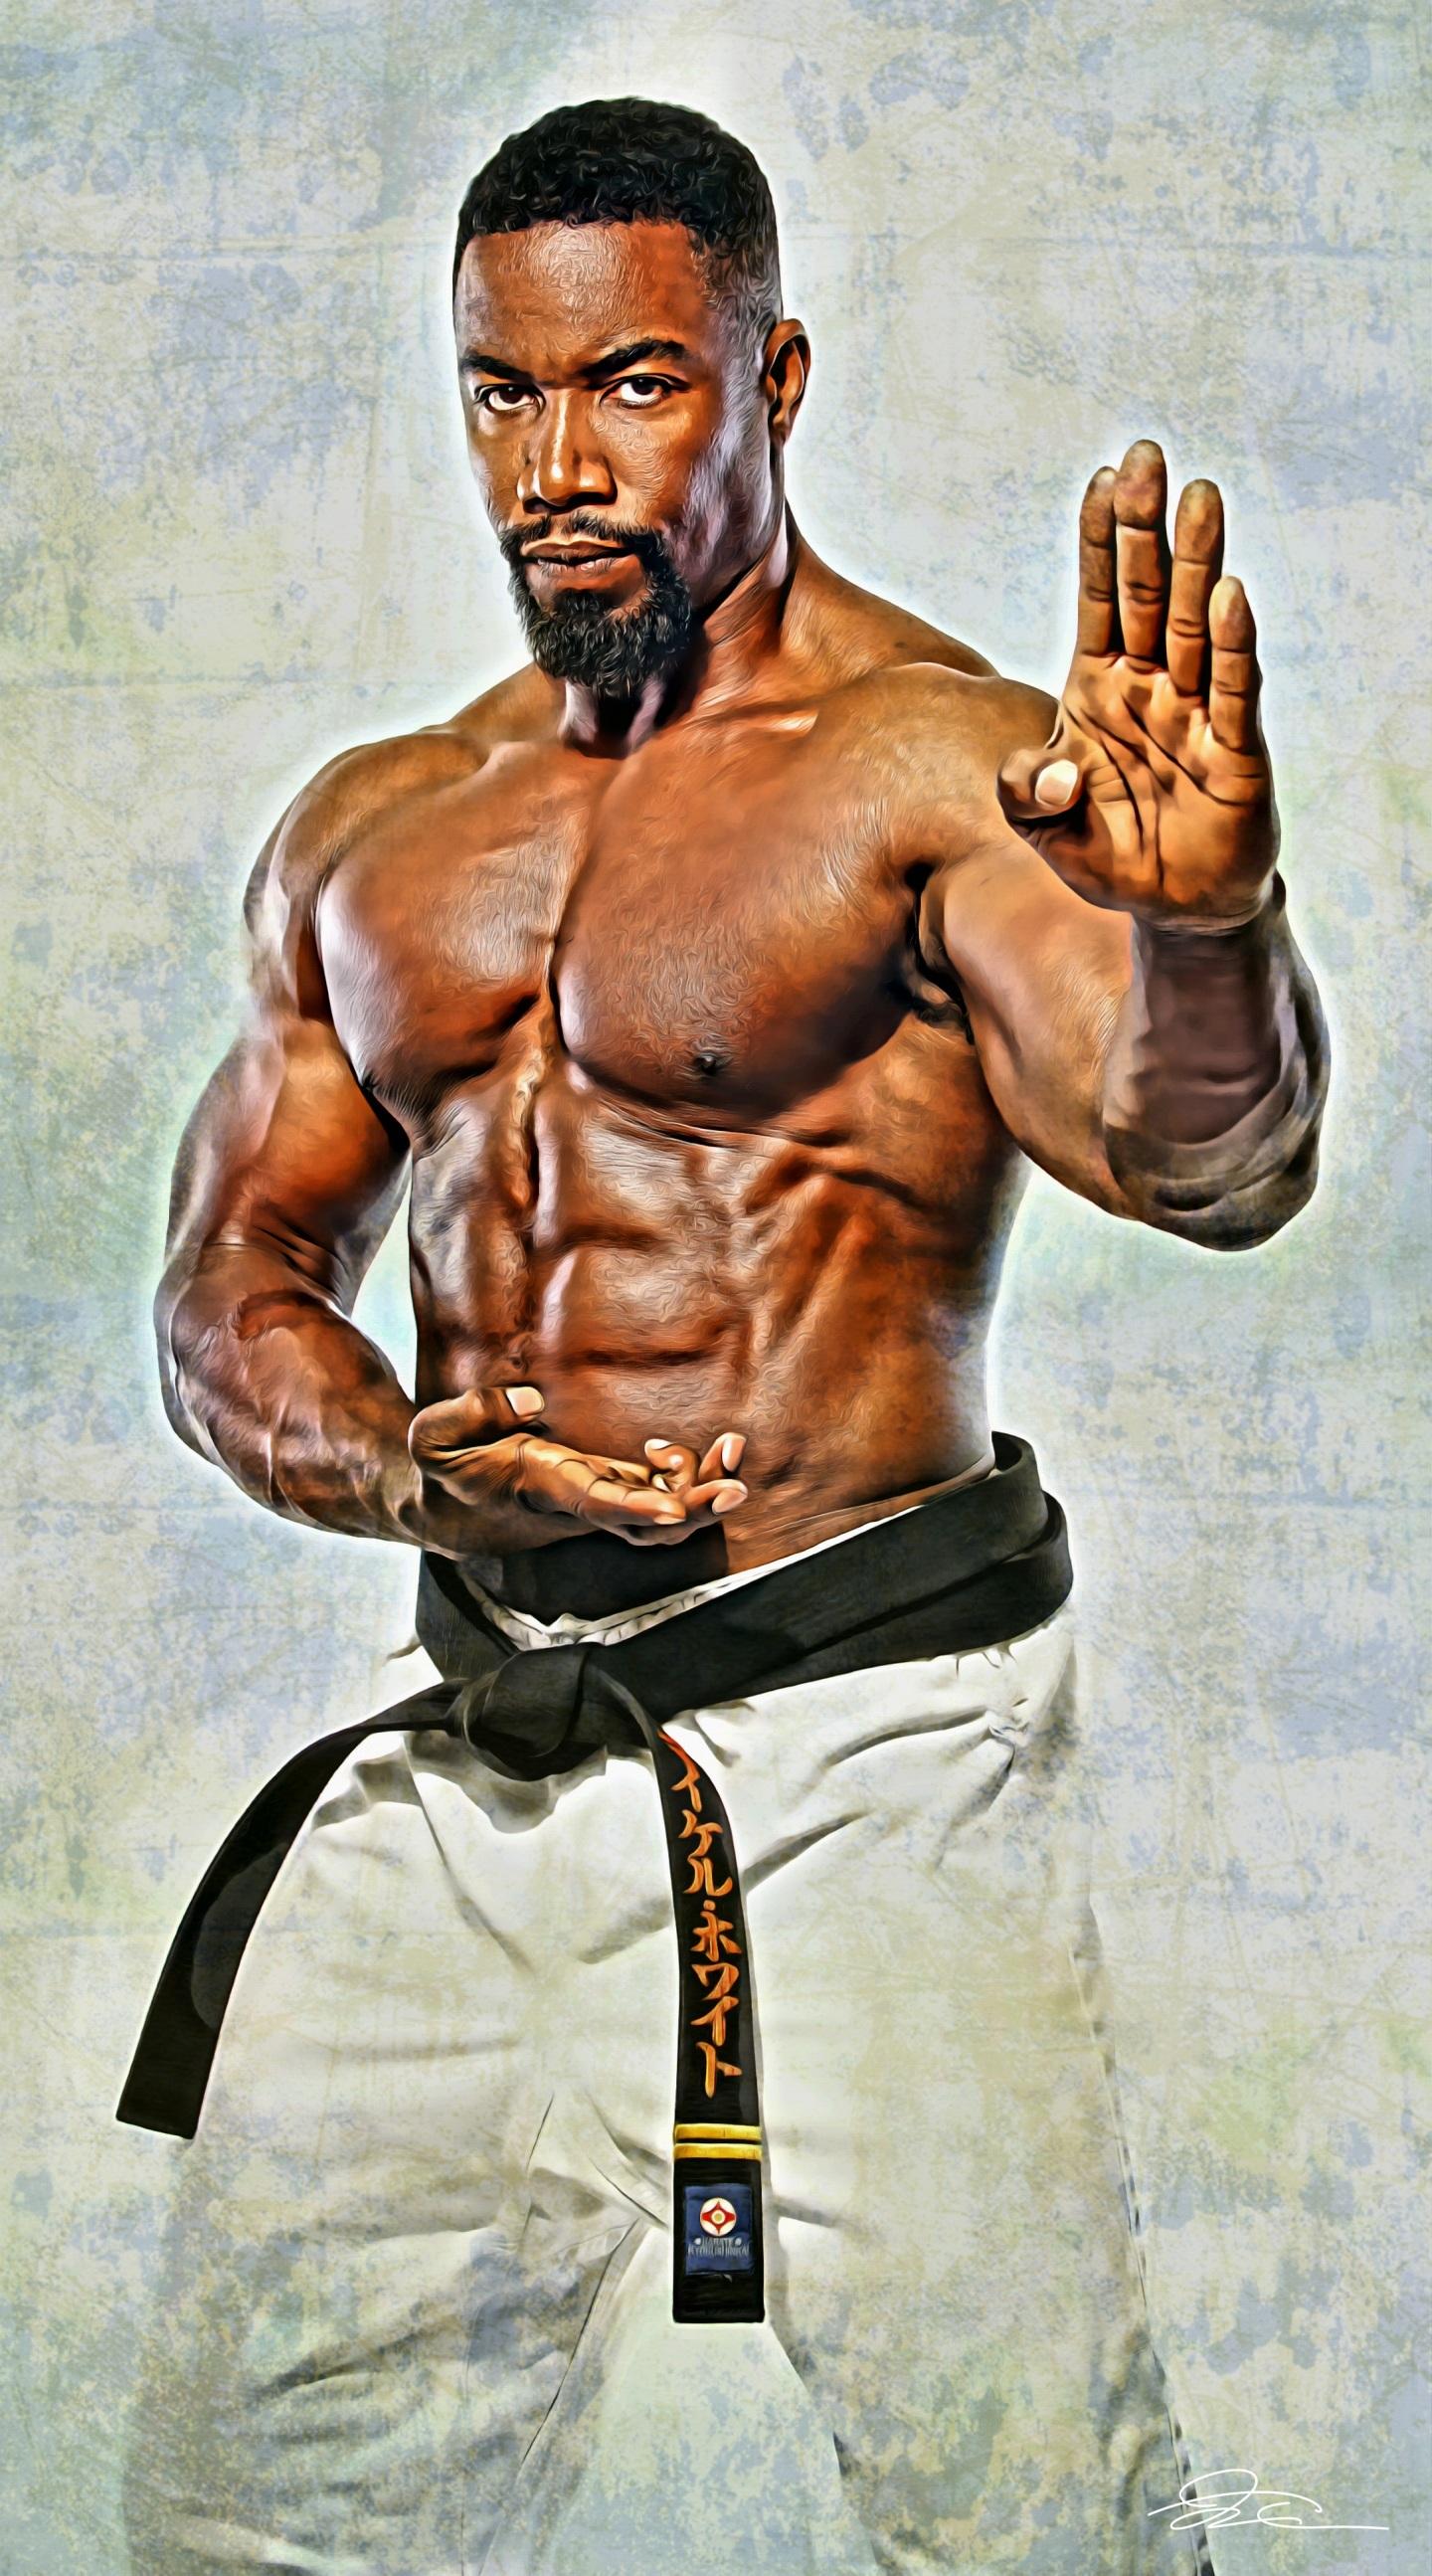 Michael Jai White Kampfkunst